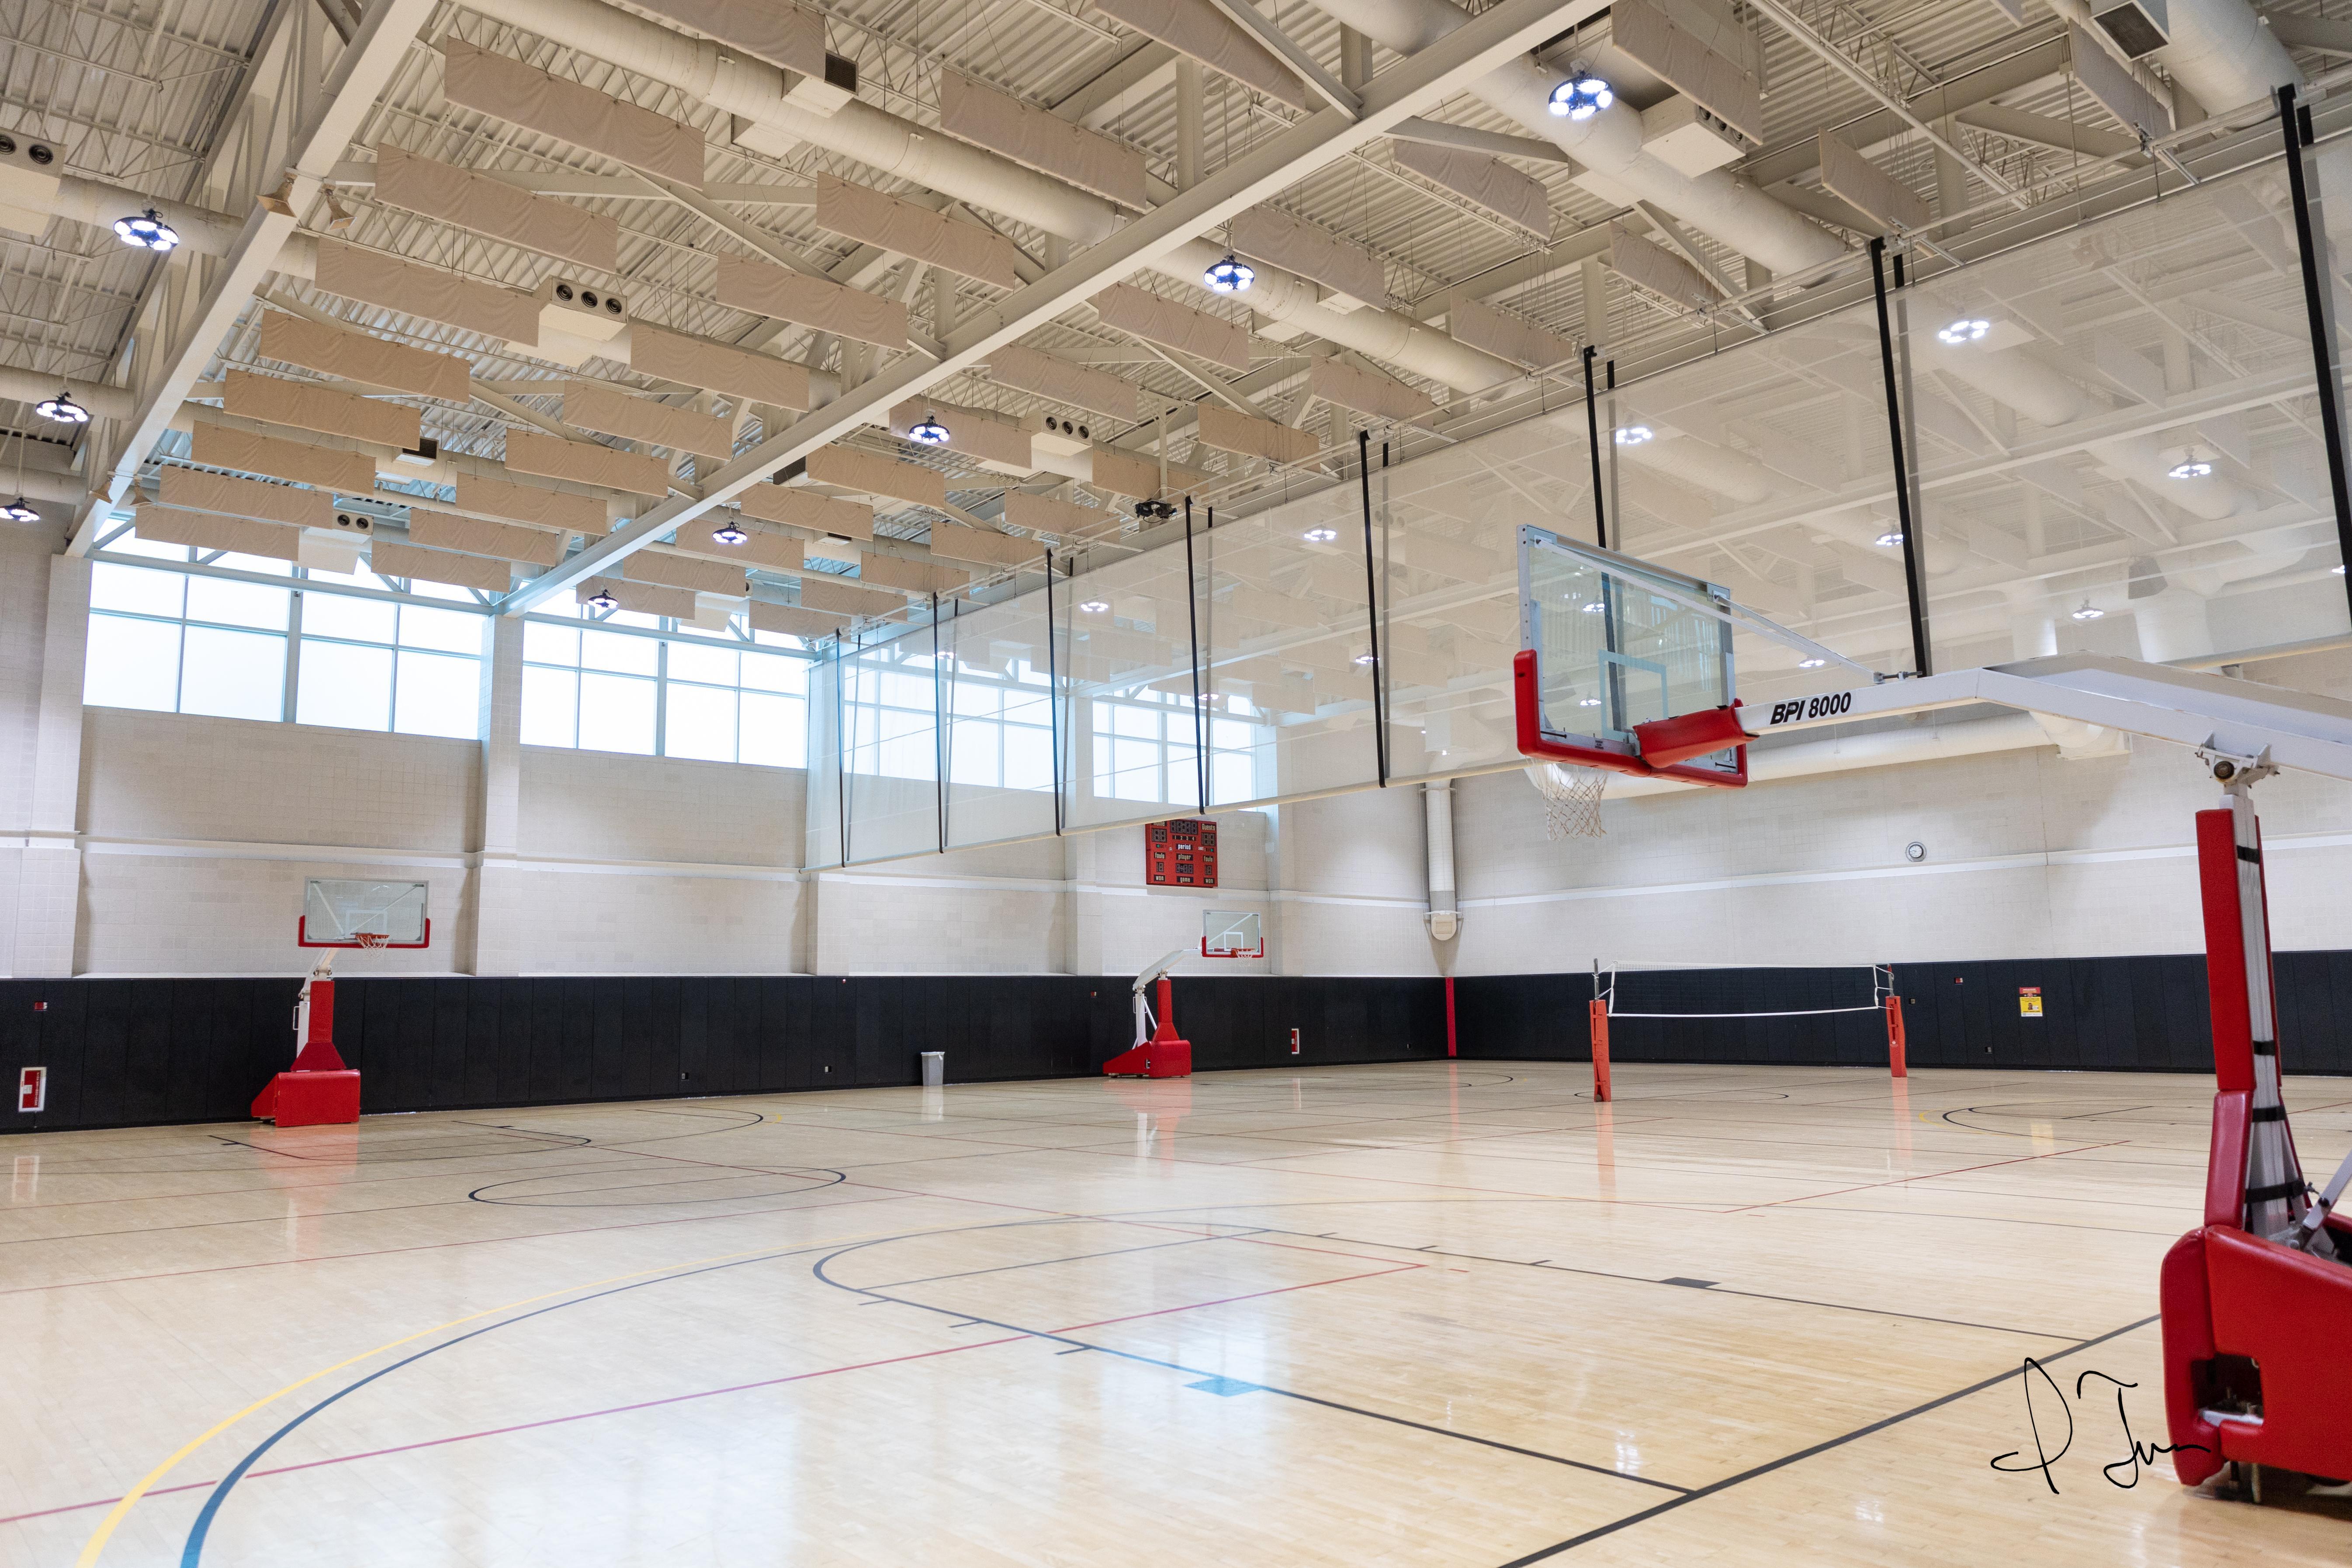 east gym basketball court